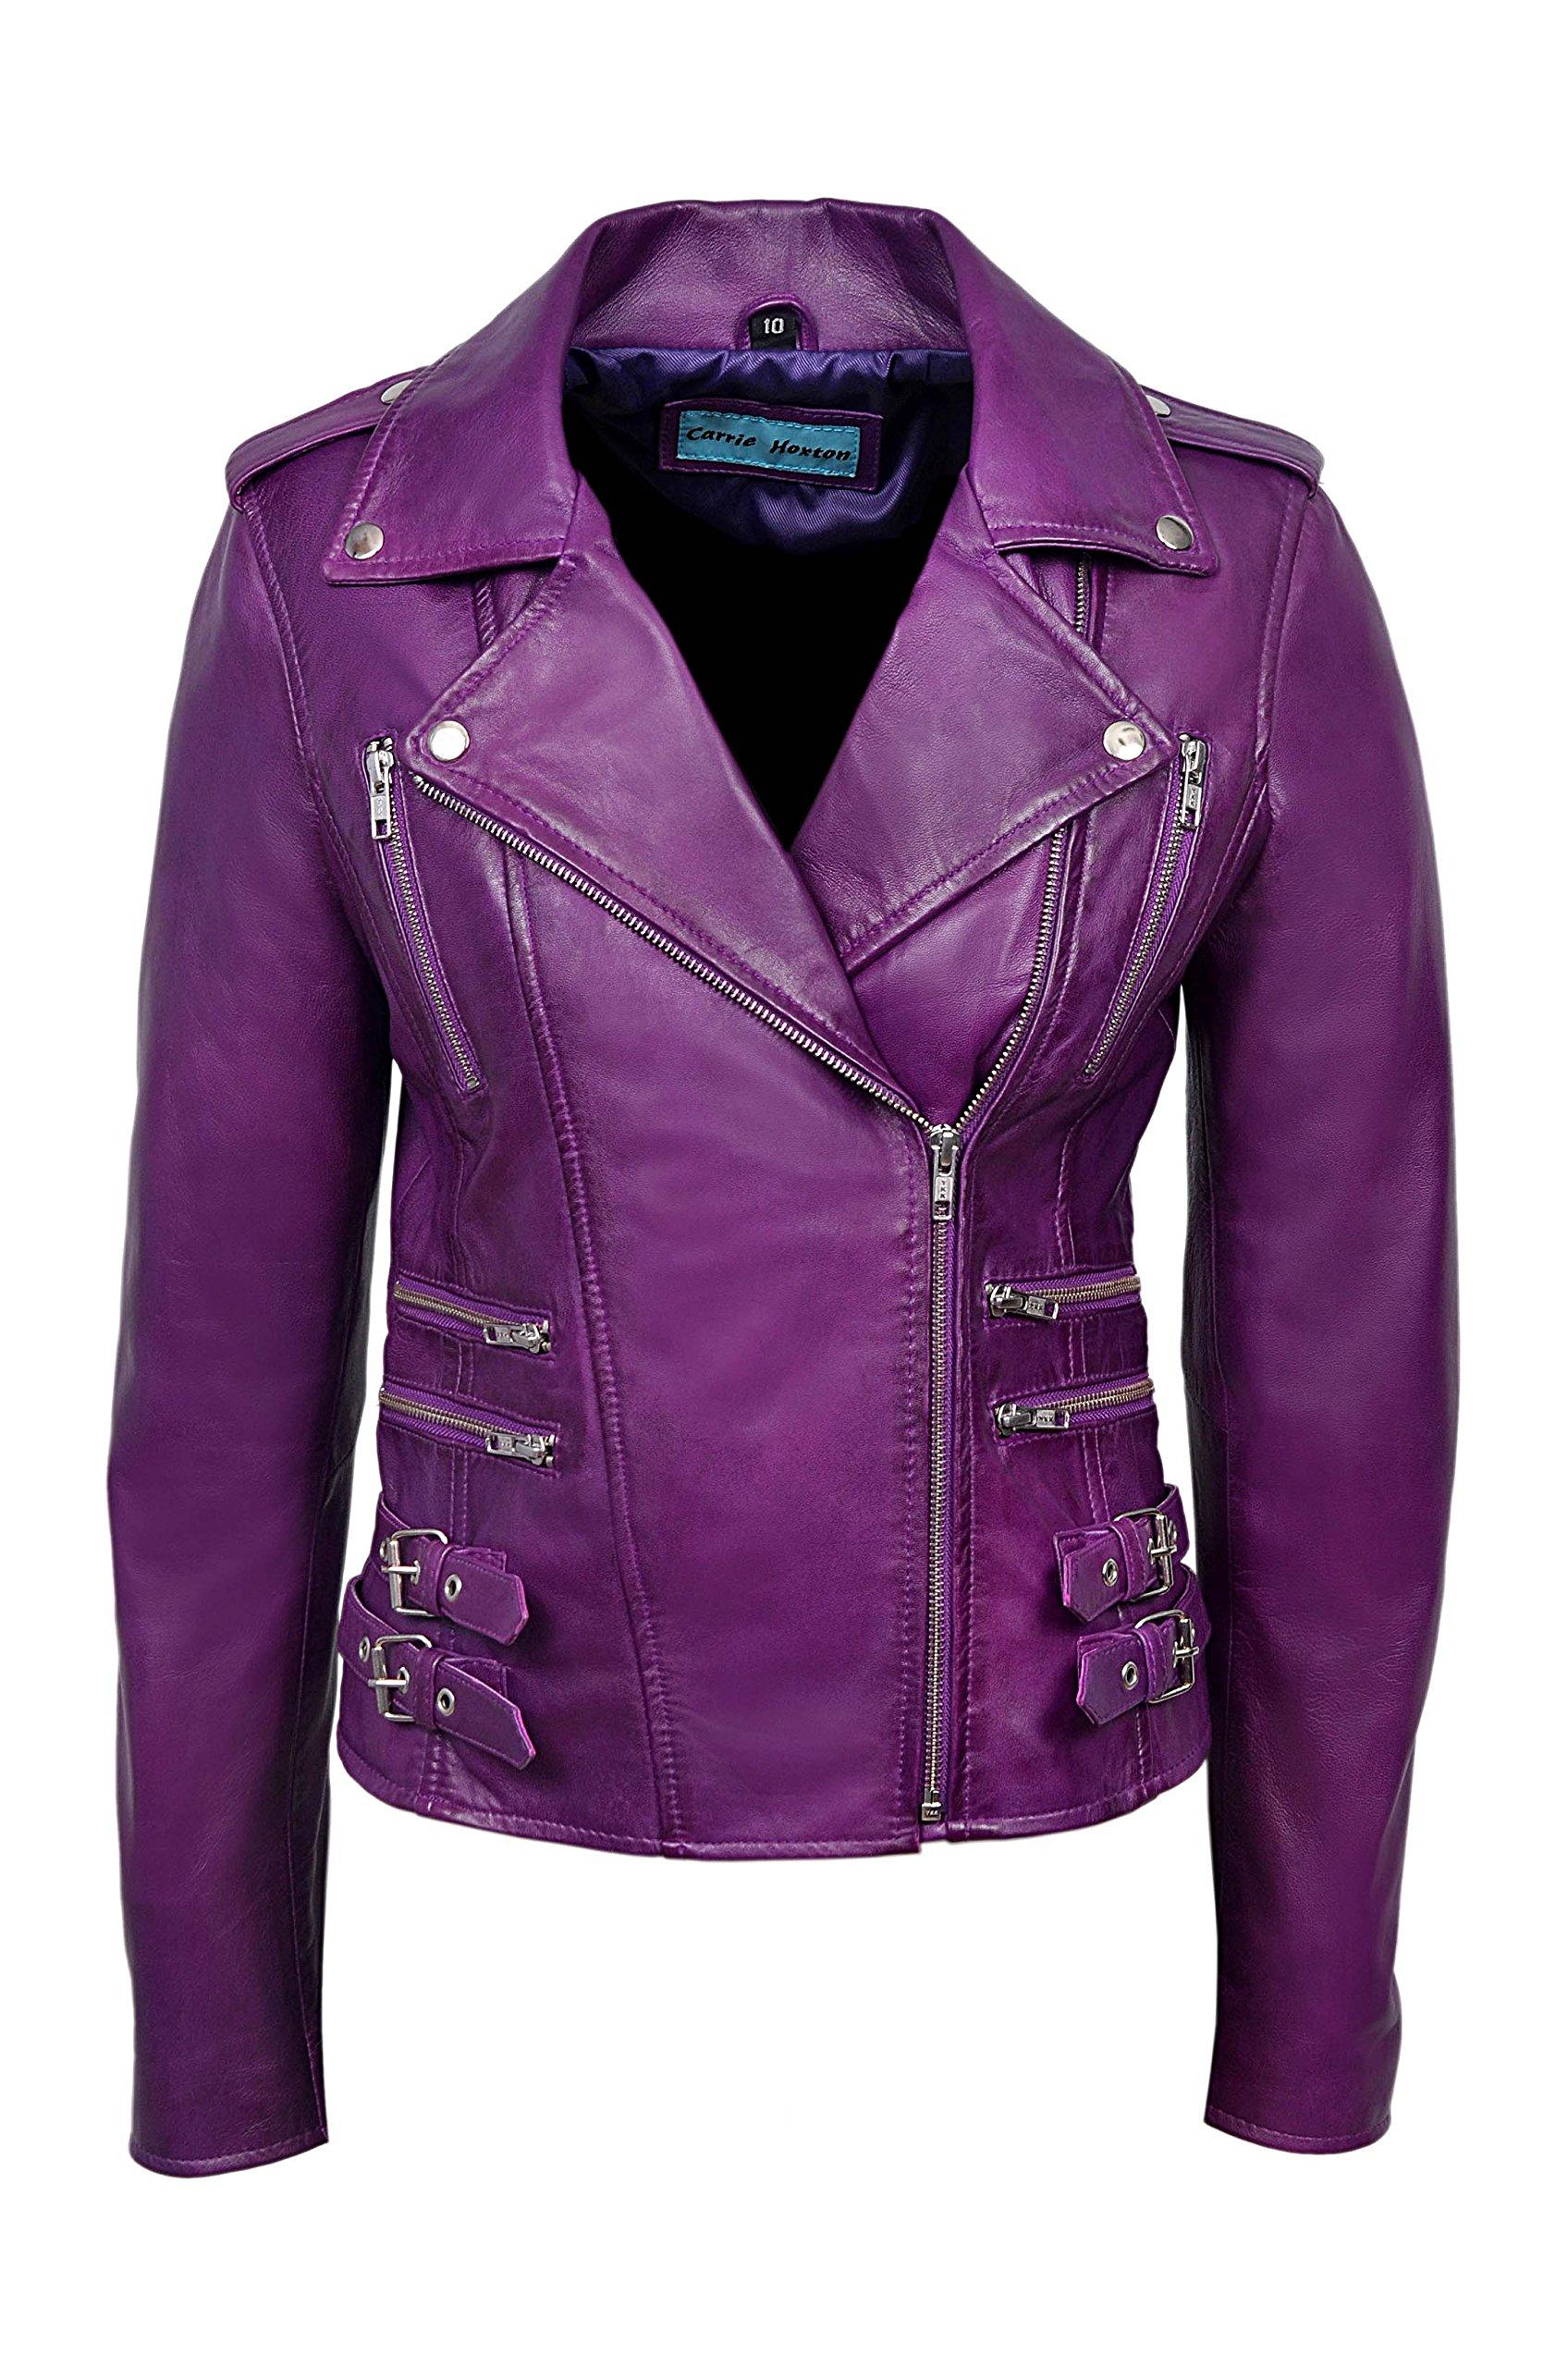 'MYSTIQUE' Ladies Purple Biker Style Motorcycle Designer Nappa Leather Jacket (UK 10/US 6)